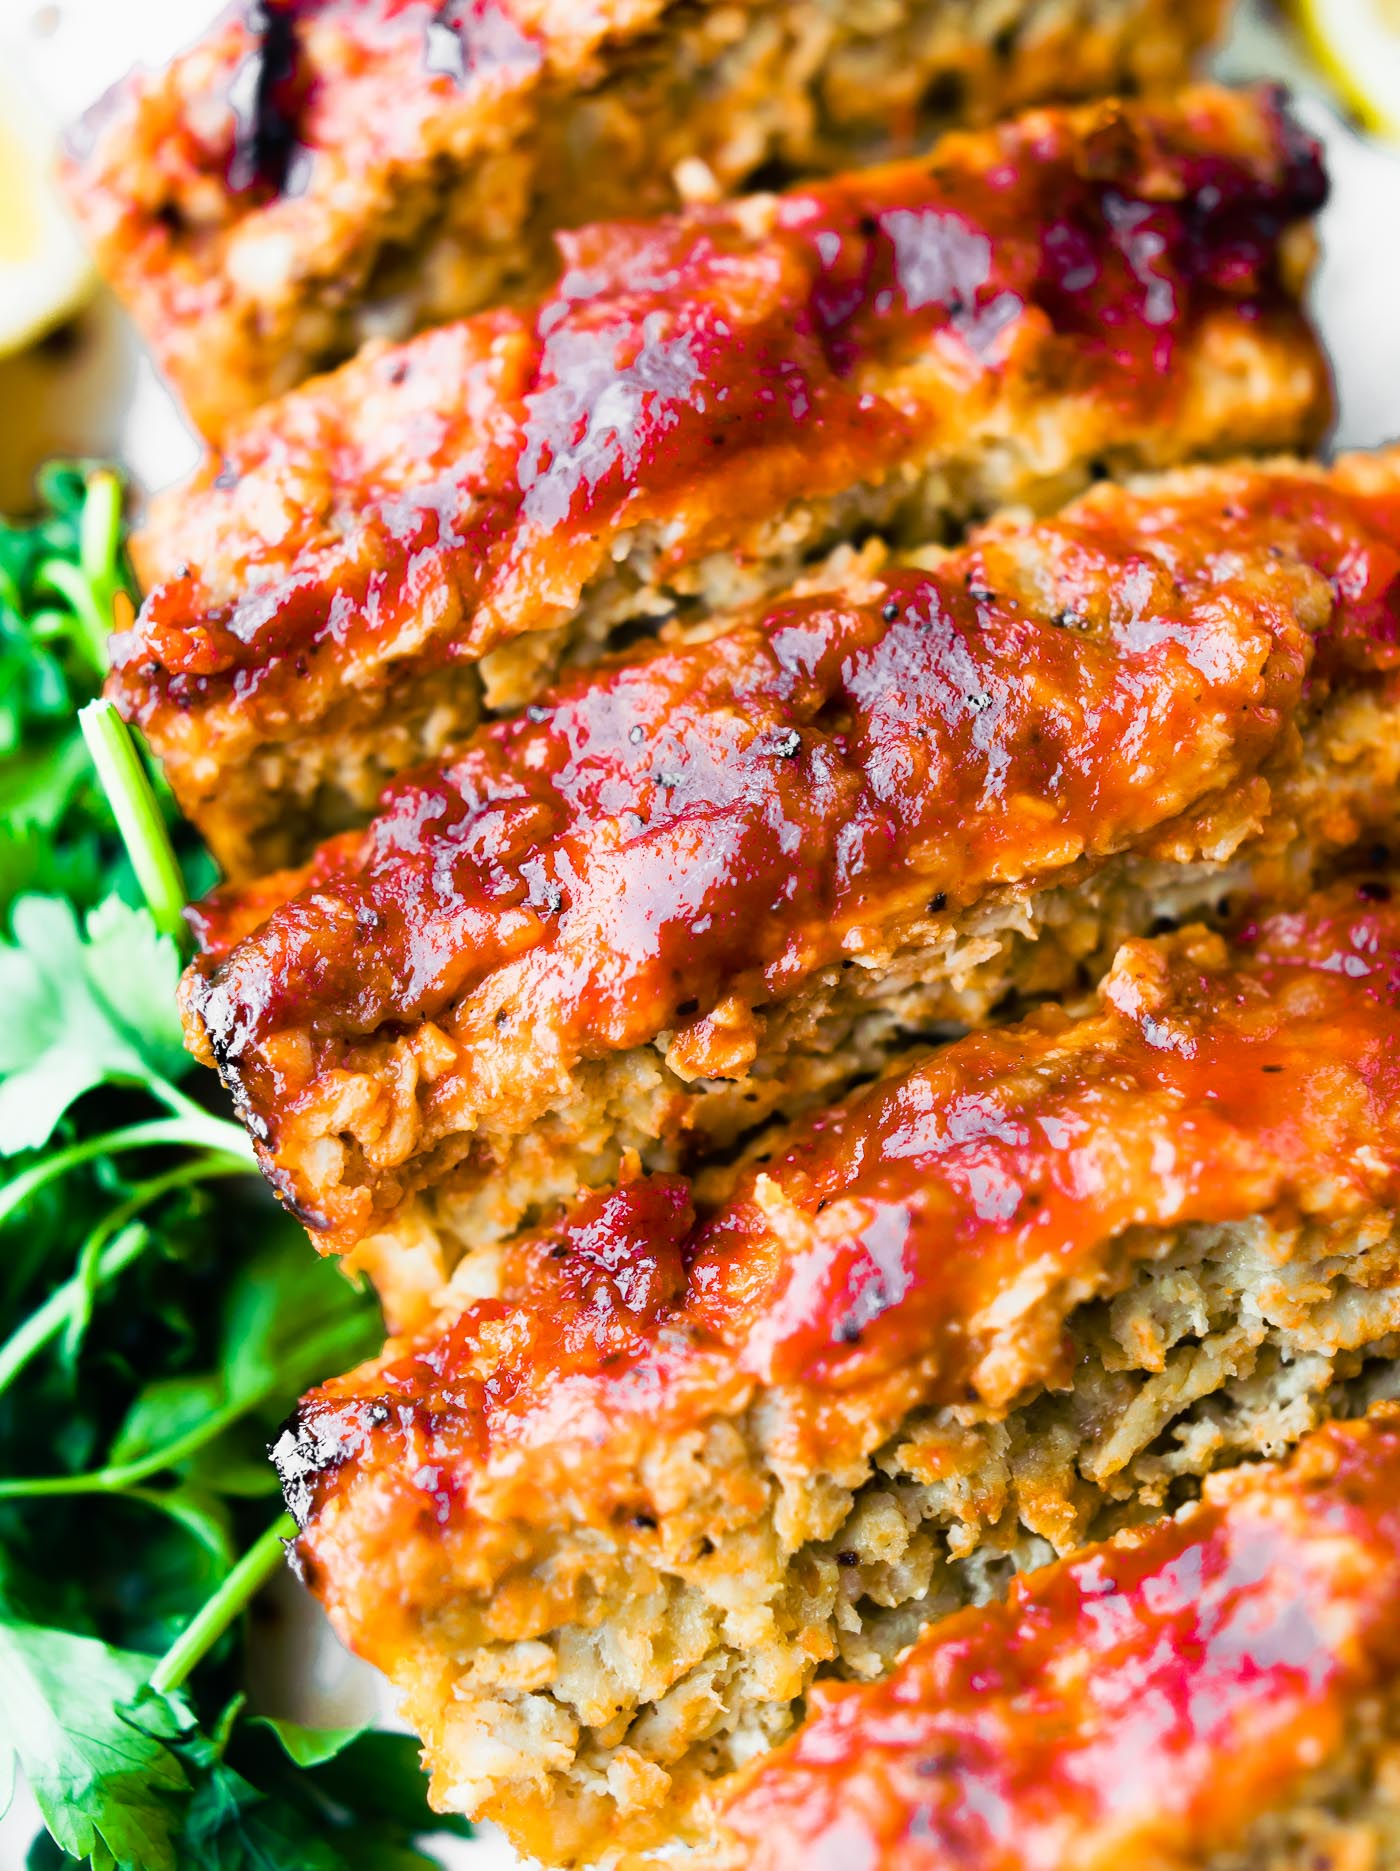 Barbecue Gluten Free Meatloaf Paleo Option Cotter Crunch